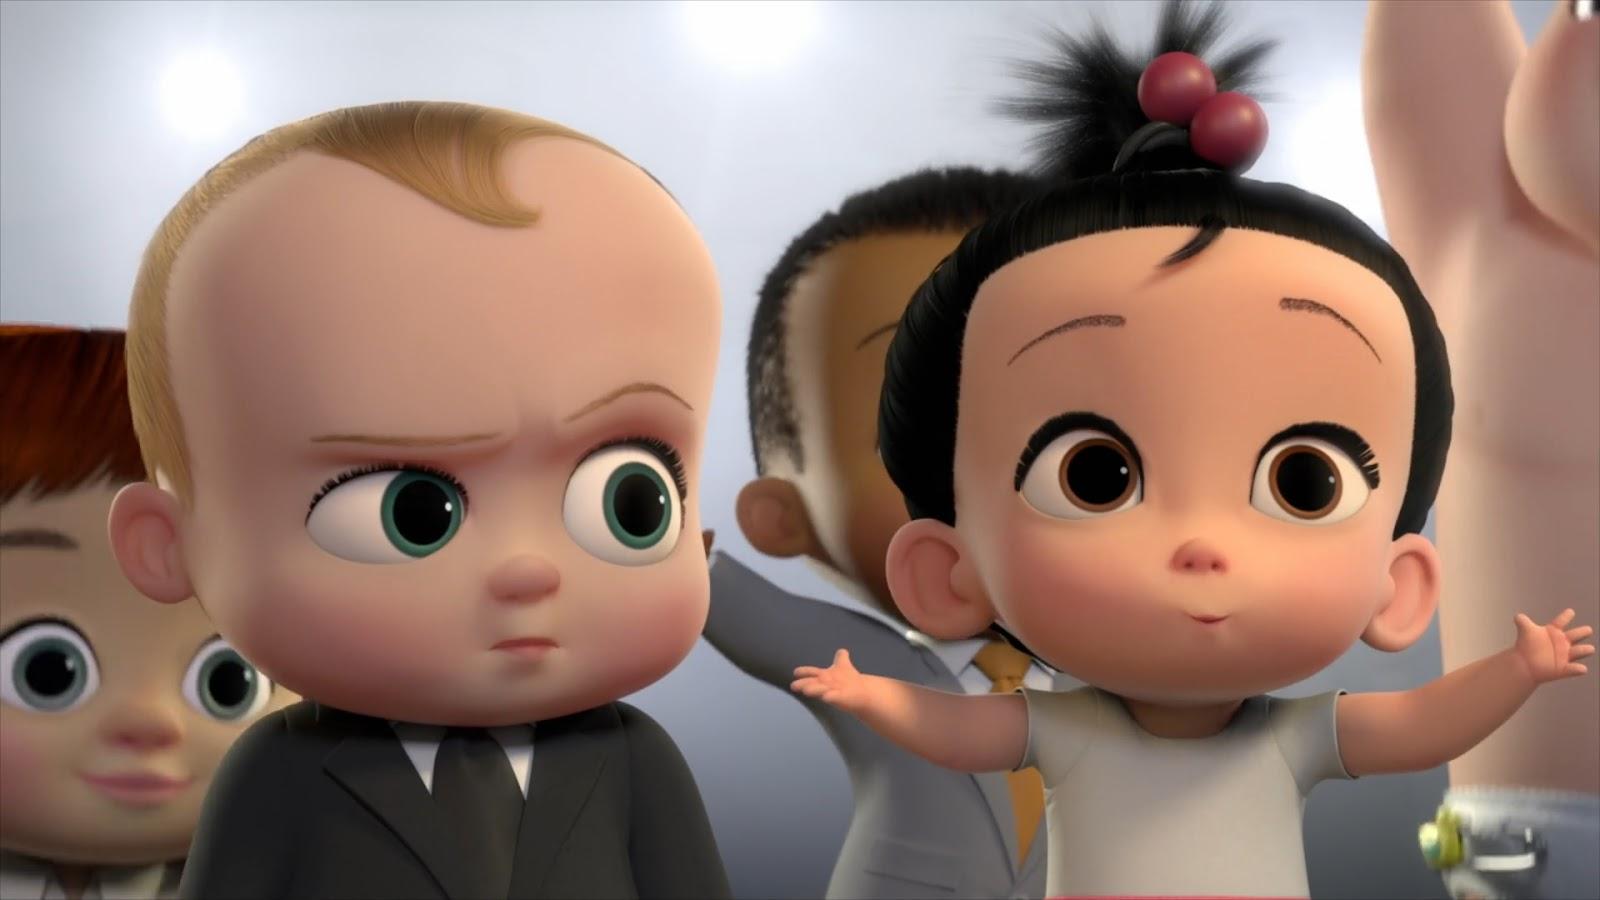 The Boss Baby La Serie T2 Completo Dual WEB-DL x264 720 Zipp